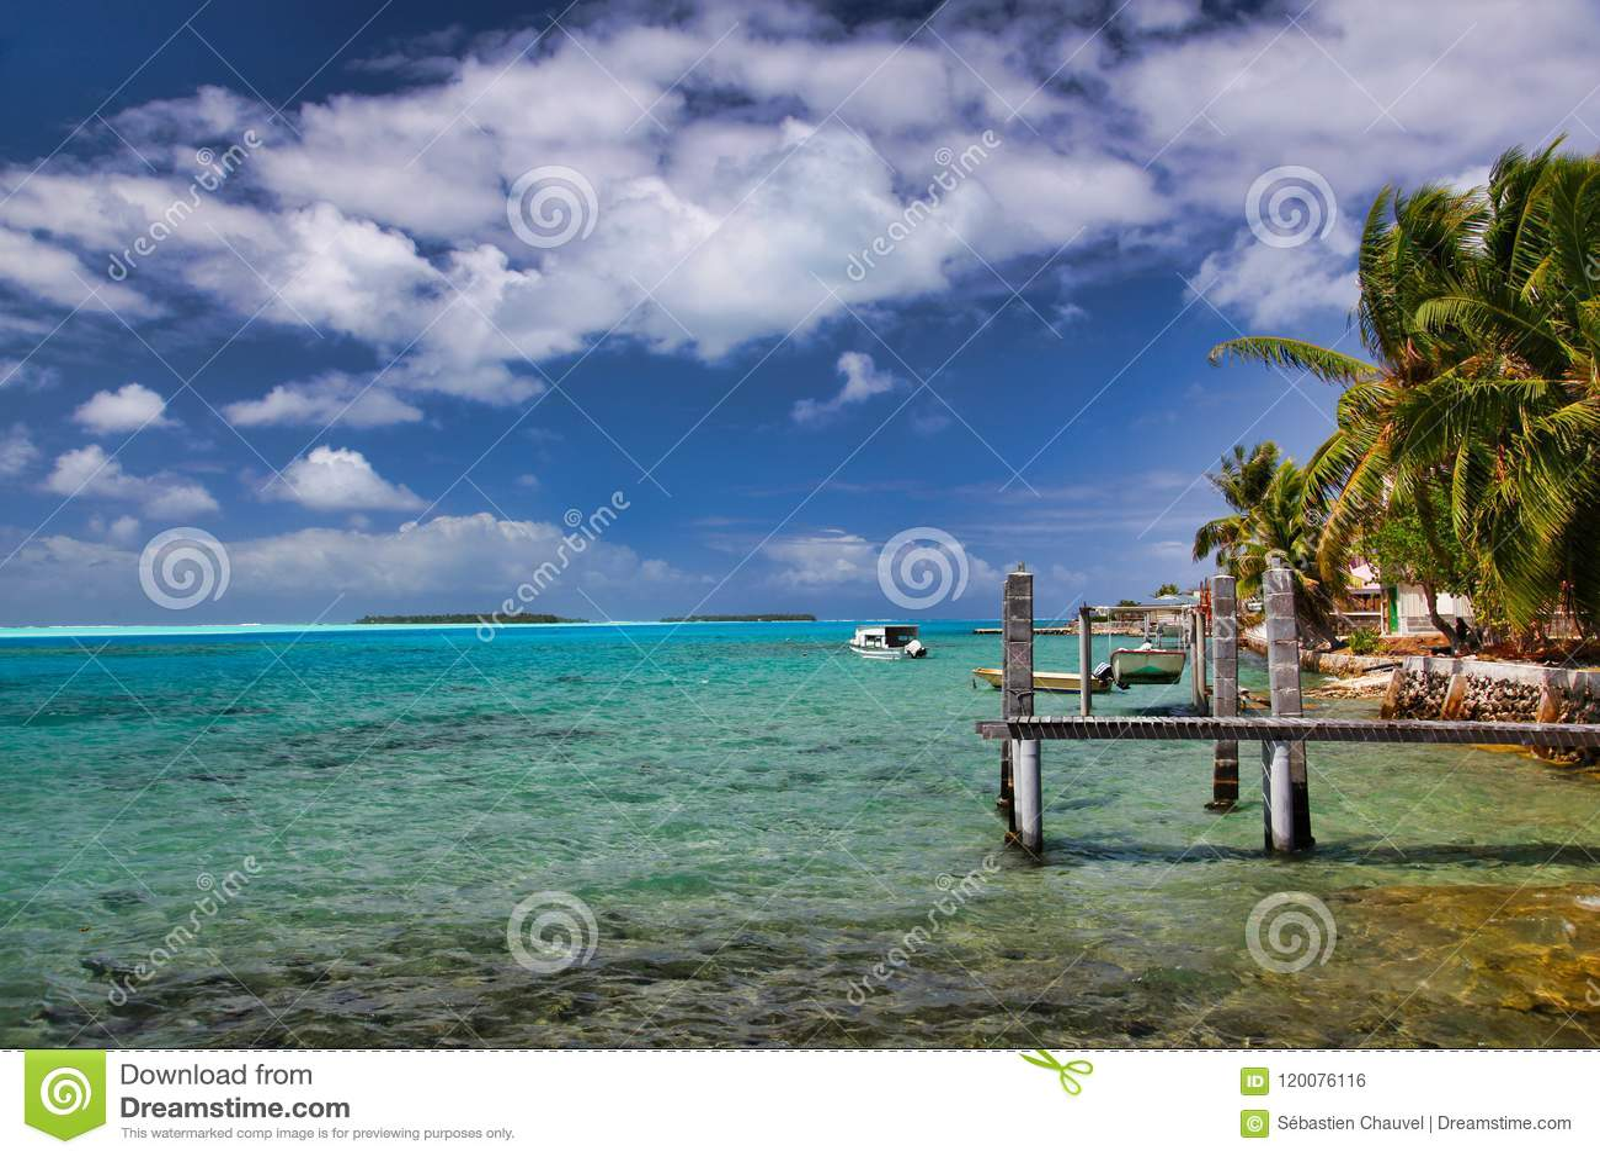 maupiti island gratuit